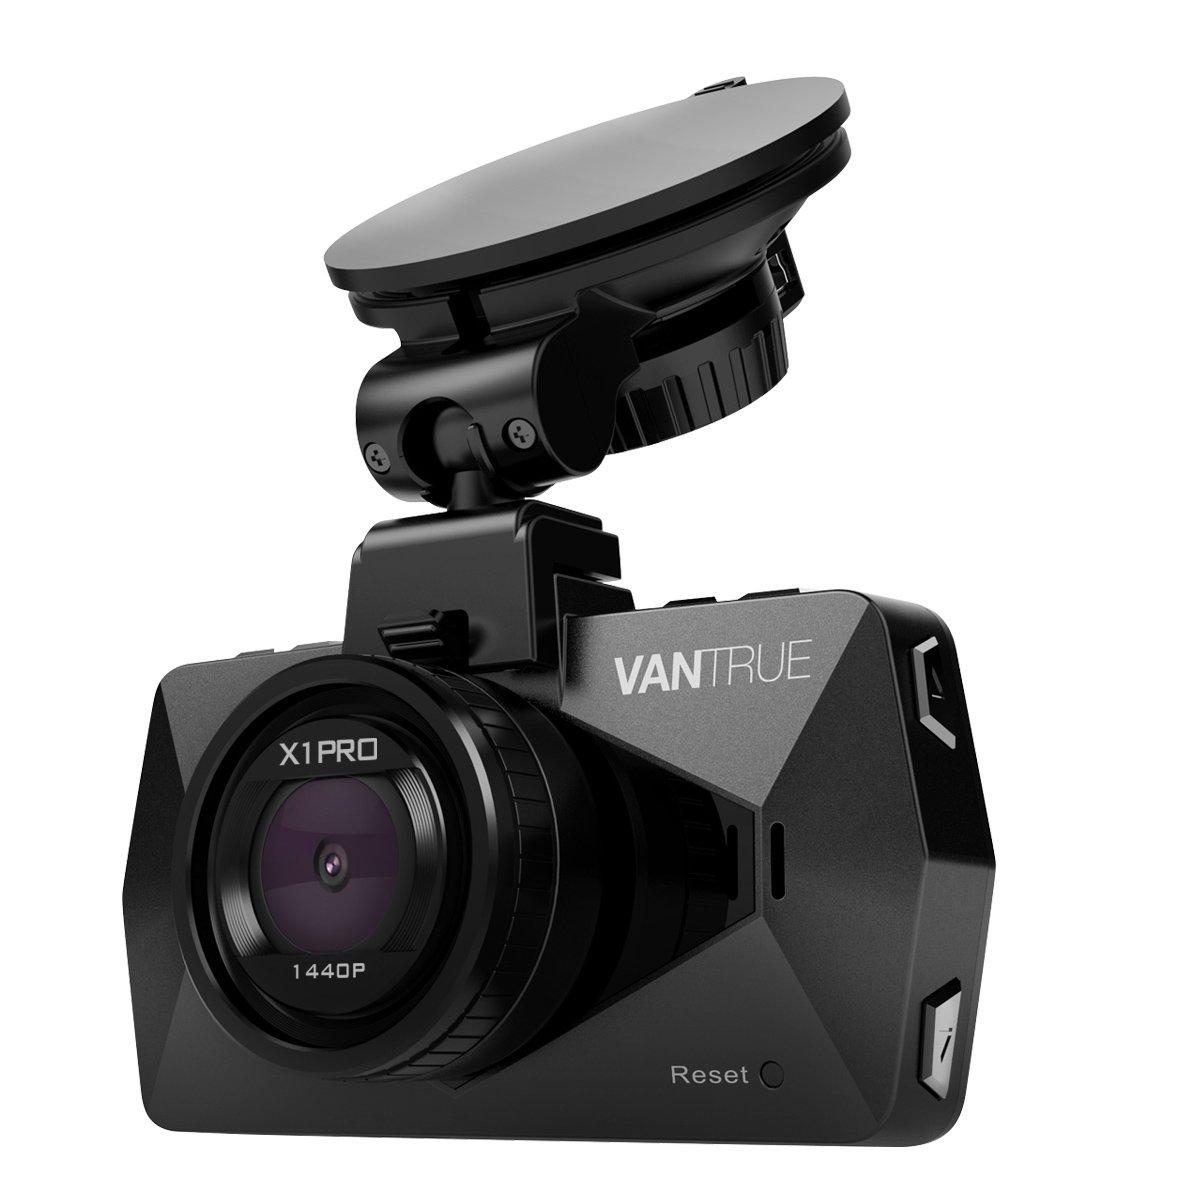 Vantrue X1 Pro 2.5K Dash Cam Super HD 1440P30 1080P60 Dashboard Camera Car Video Recorder w/ 170° Wide Angle, Parking Mode, Super Night Vision, Time lapse, 2.7'' LCD, Motion Detection